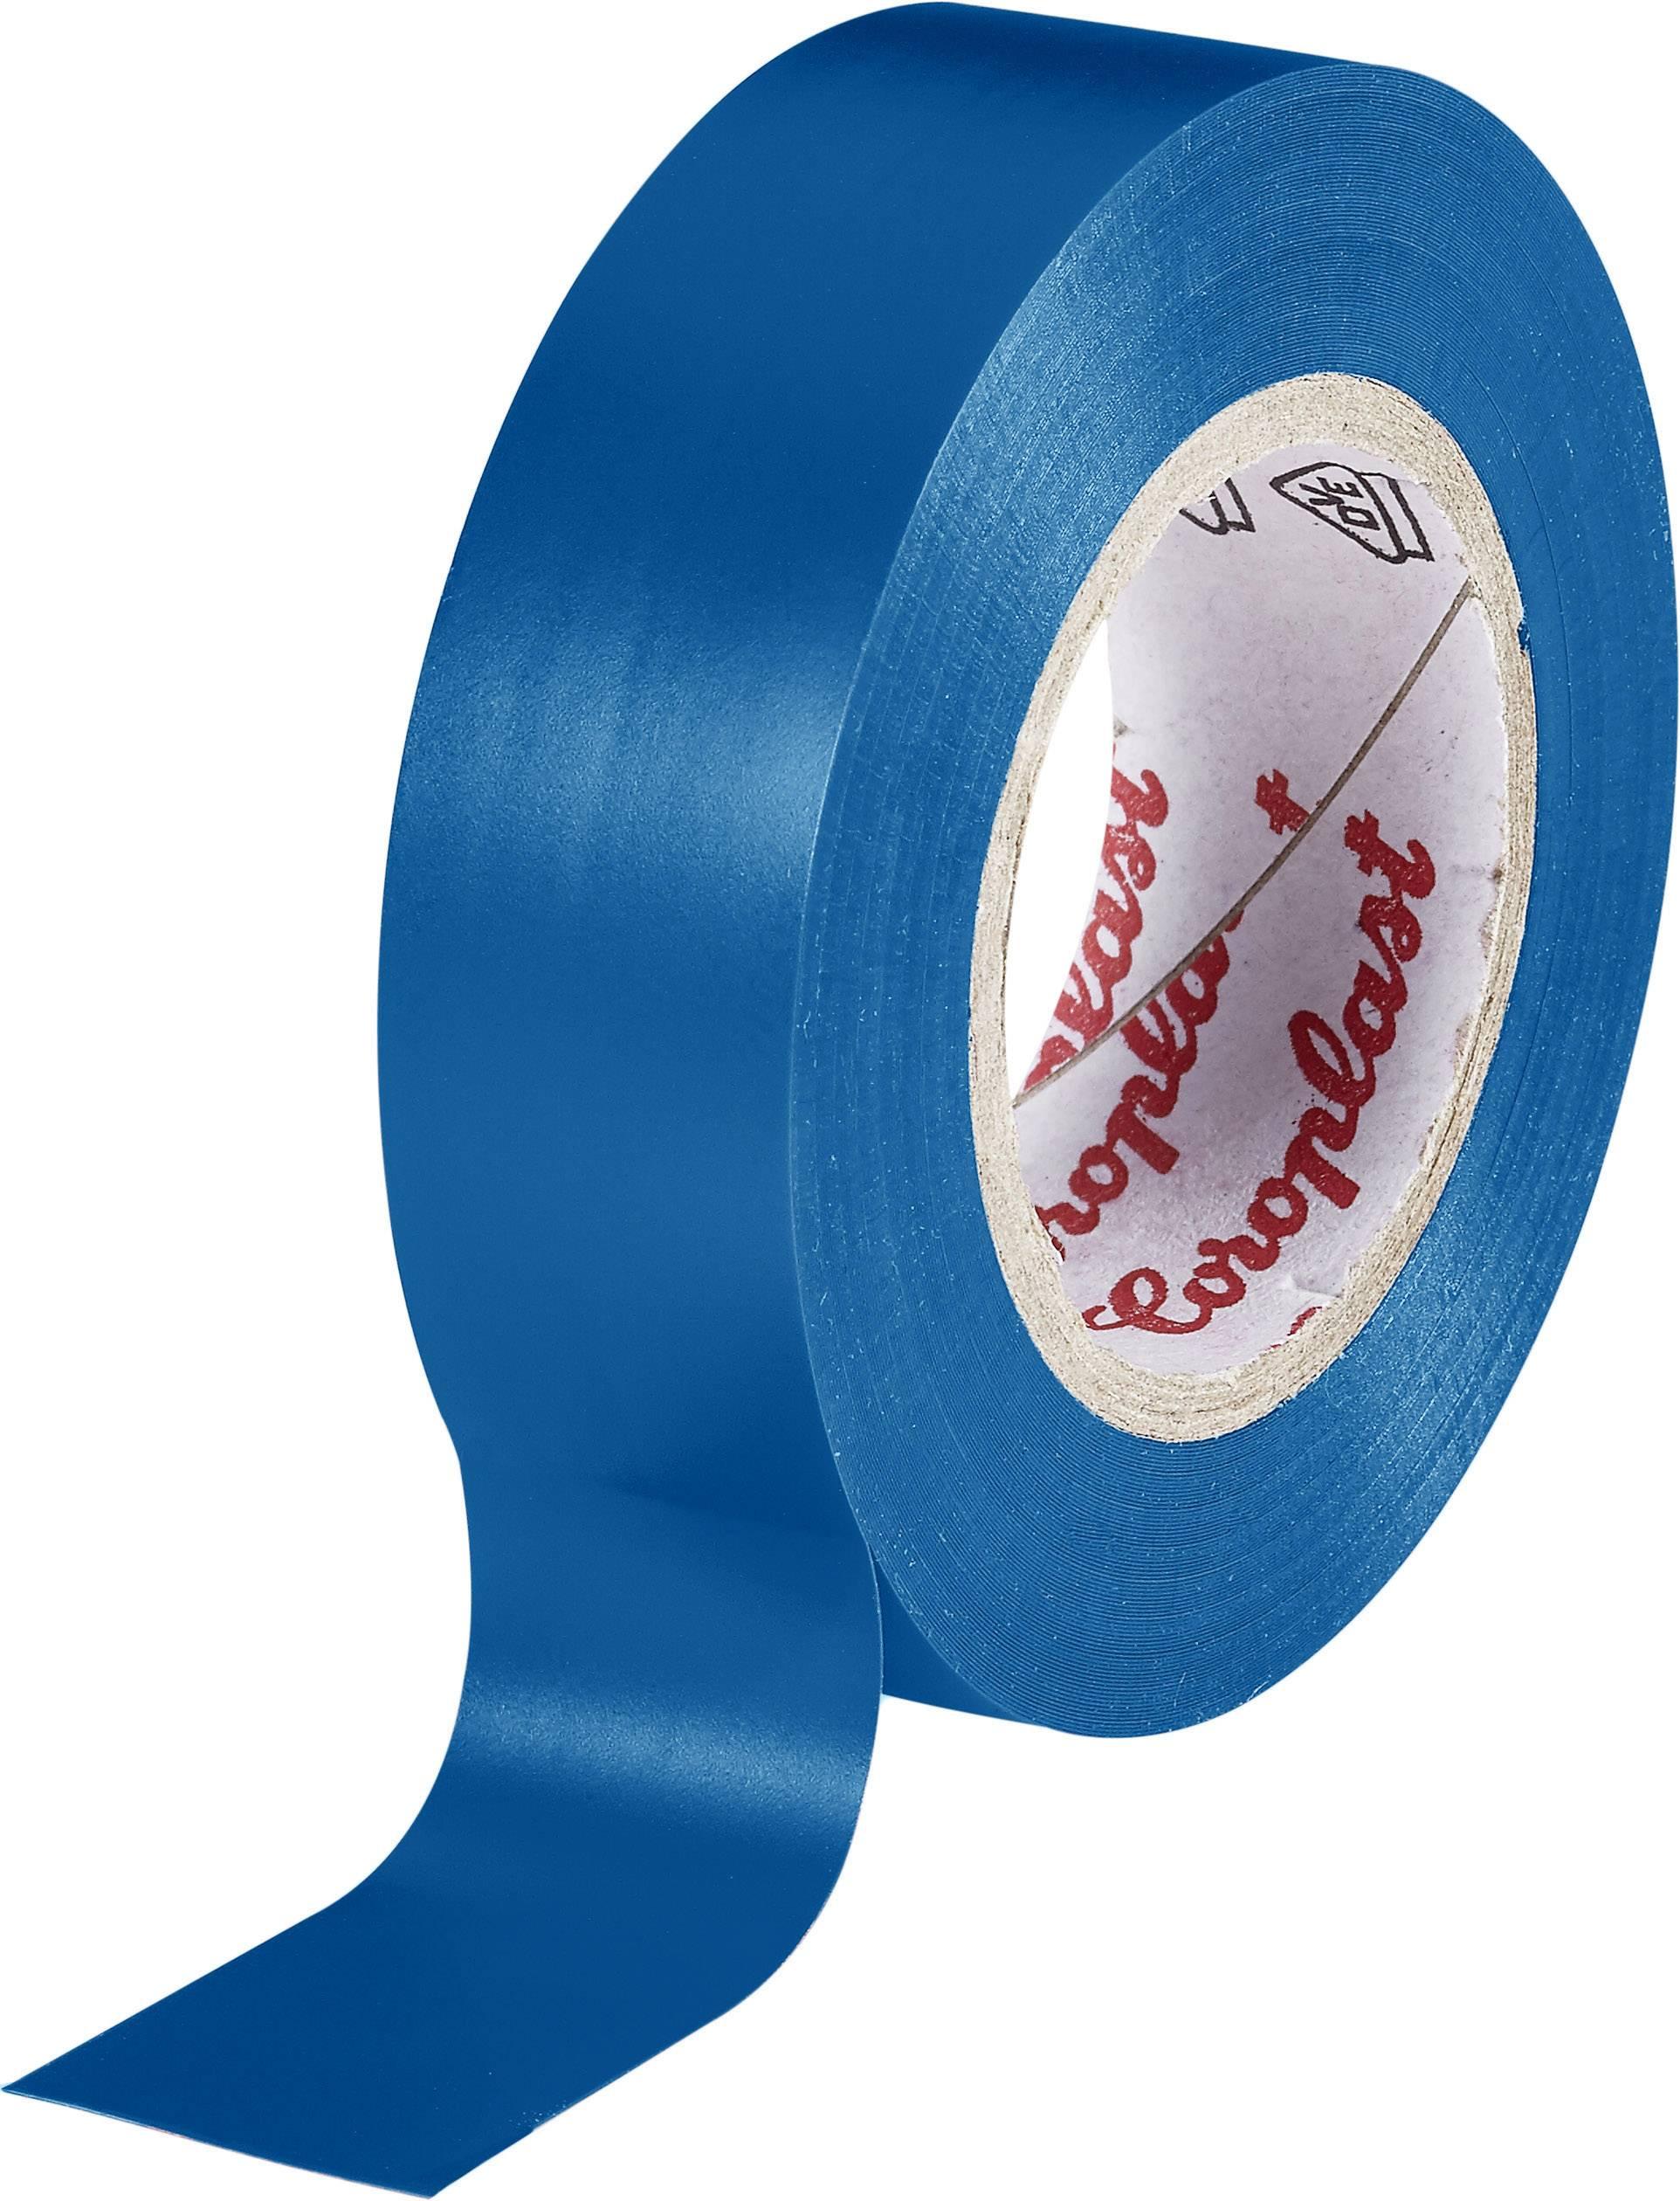 Izolační páska Coroplast, 302, 15 mm x 10 m, modrá